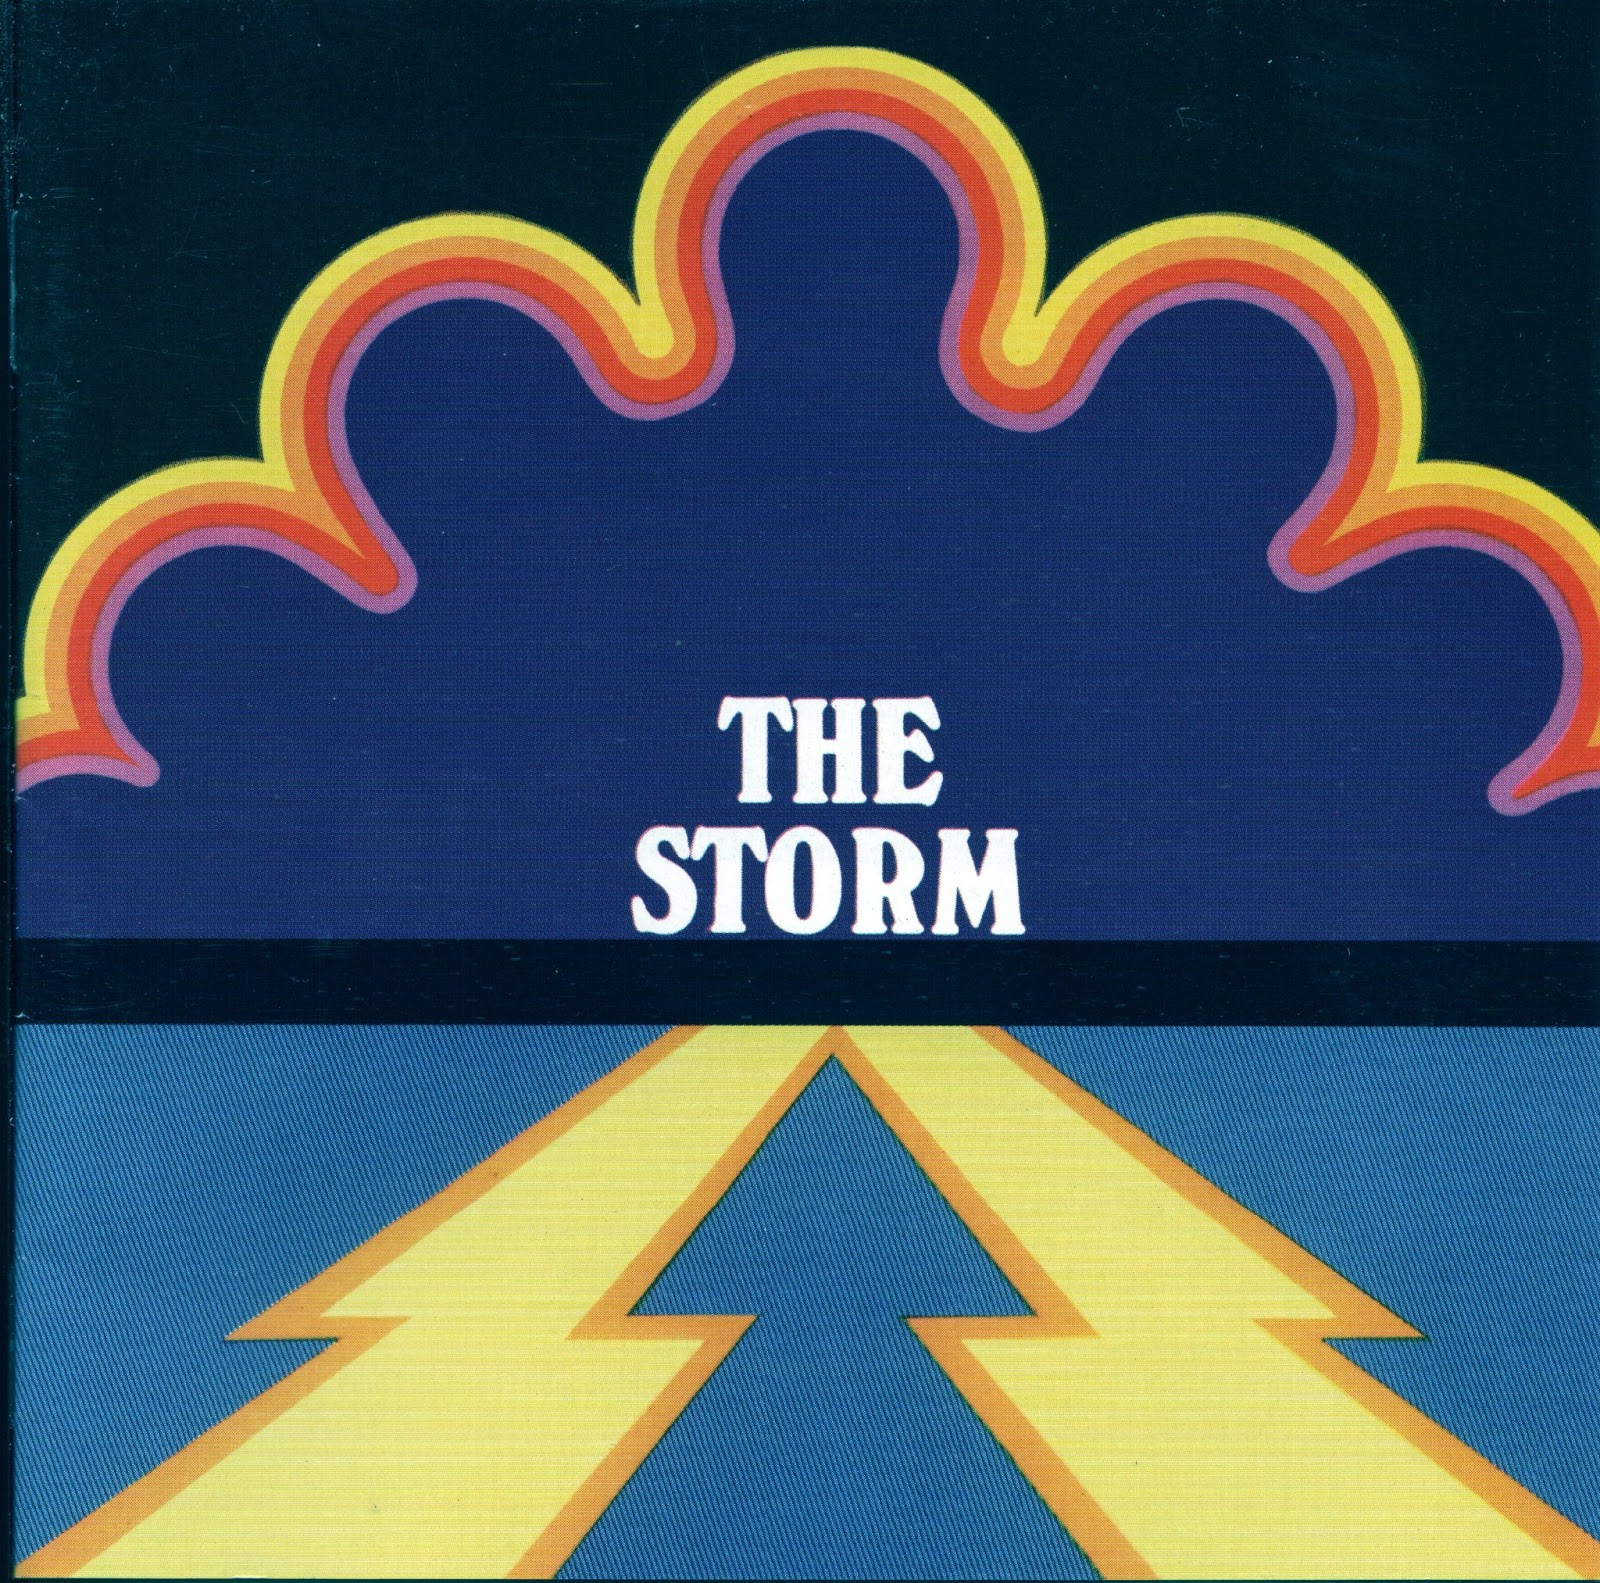 The Storm - The Storm (1974 Spanish proto-prog hard rock, 2006 Wah